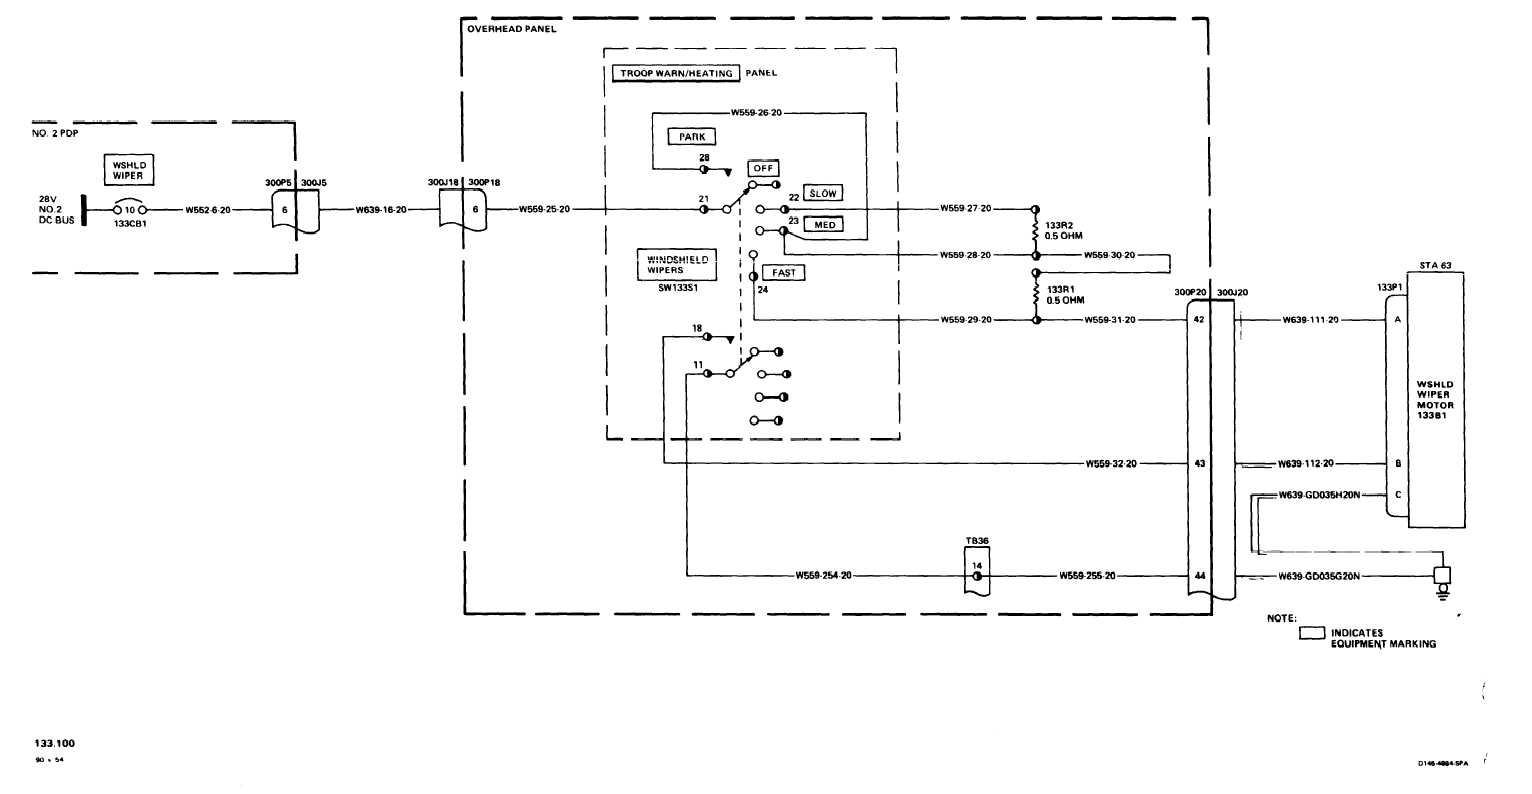 67 dodge ignition wiring diagram circuit diagrams image